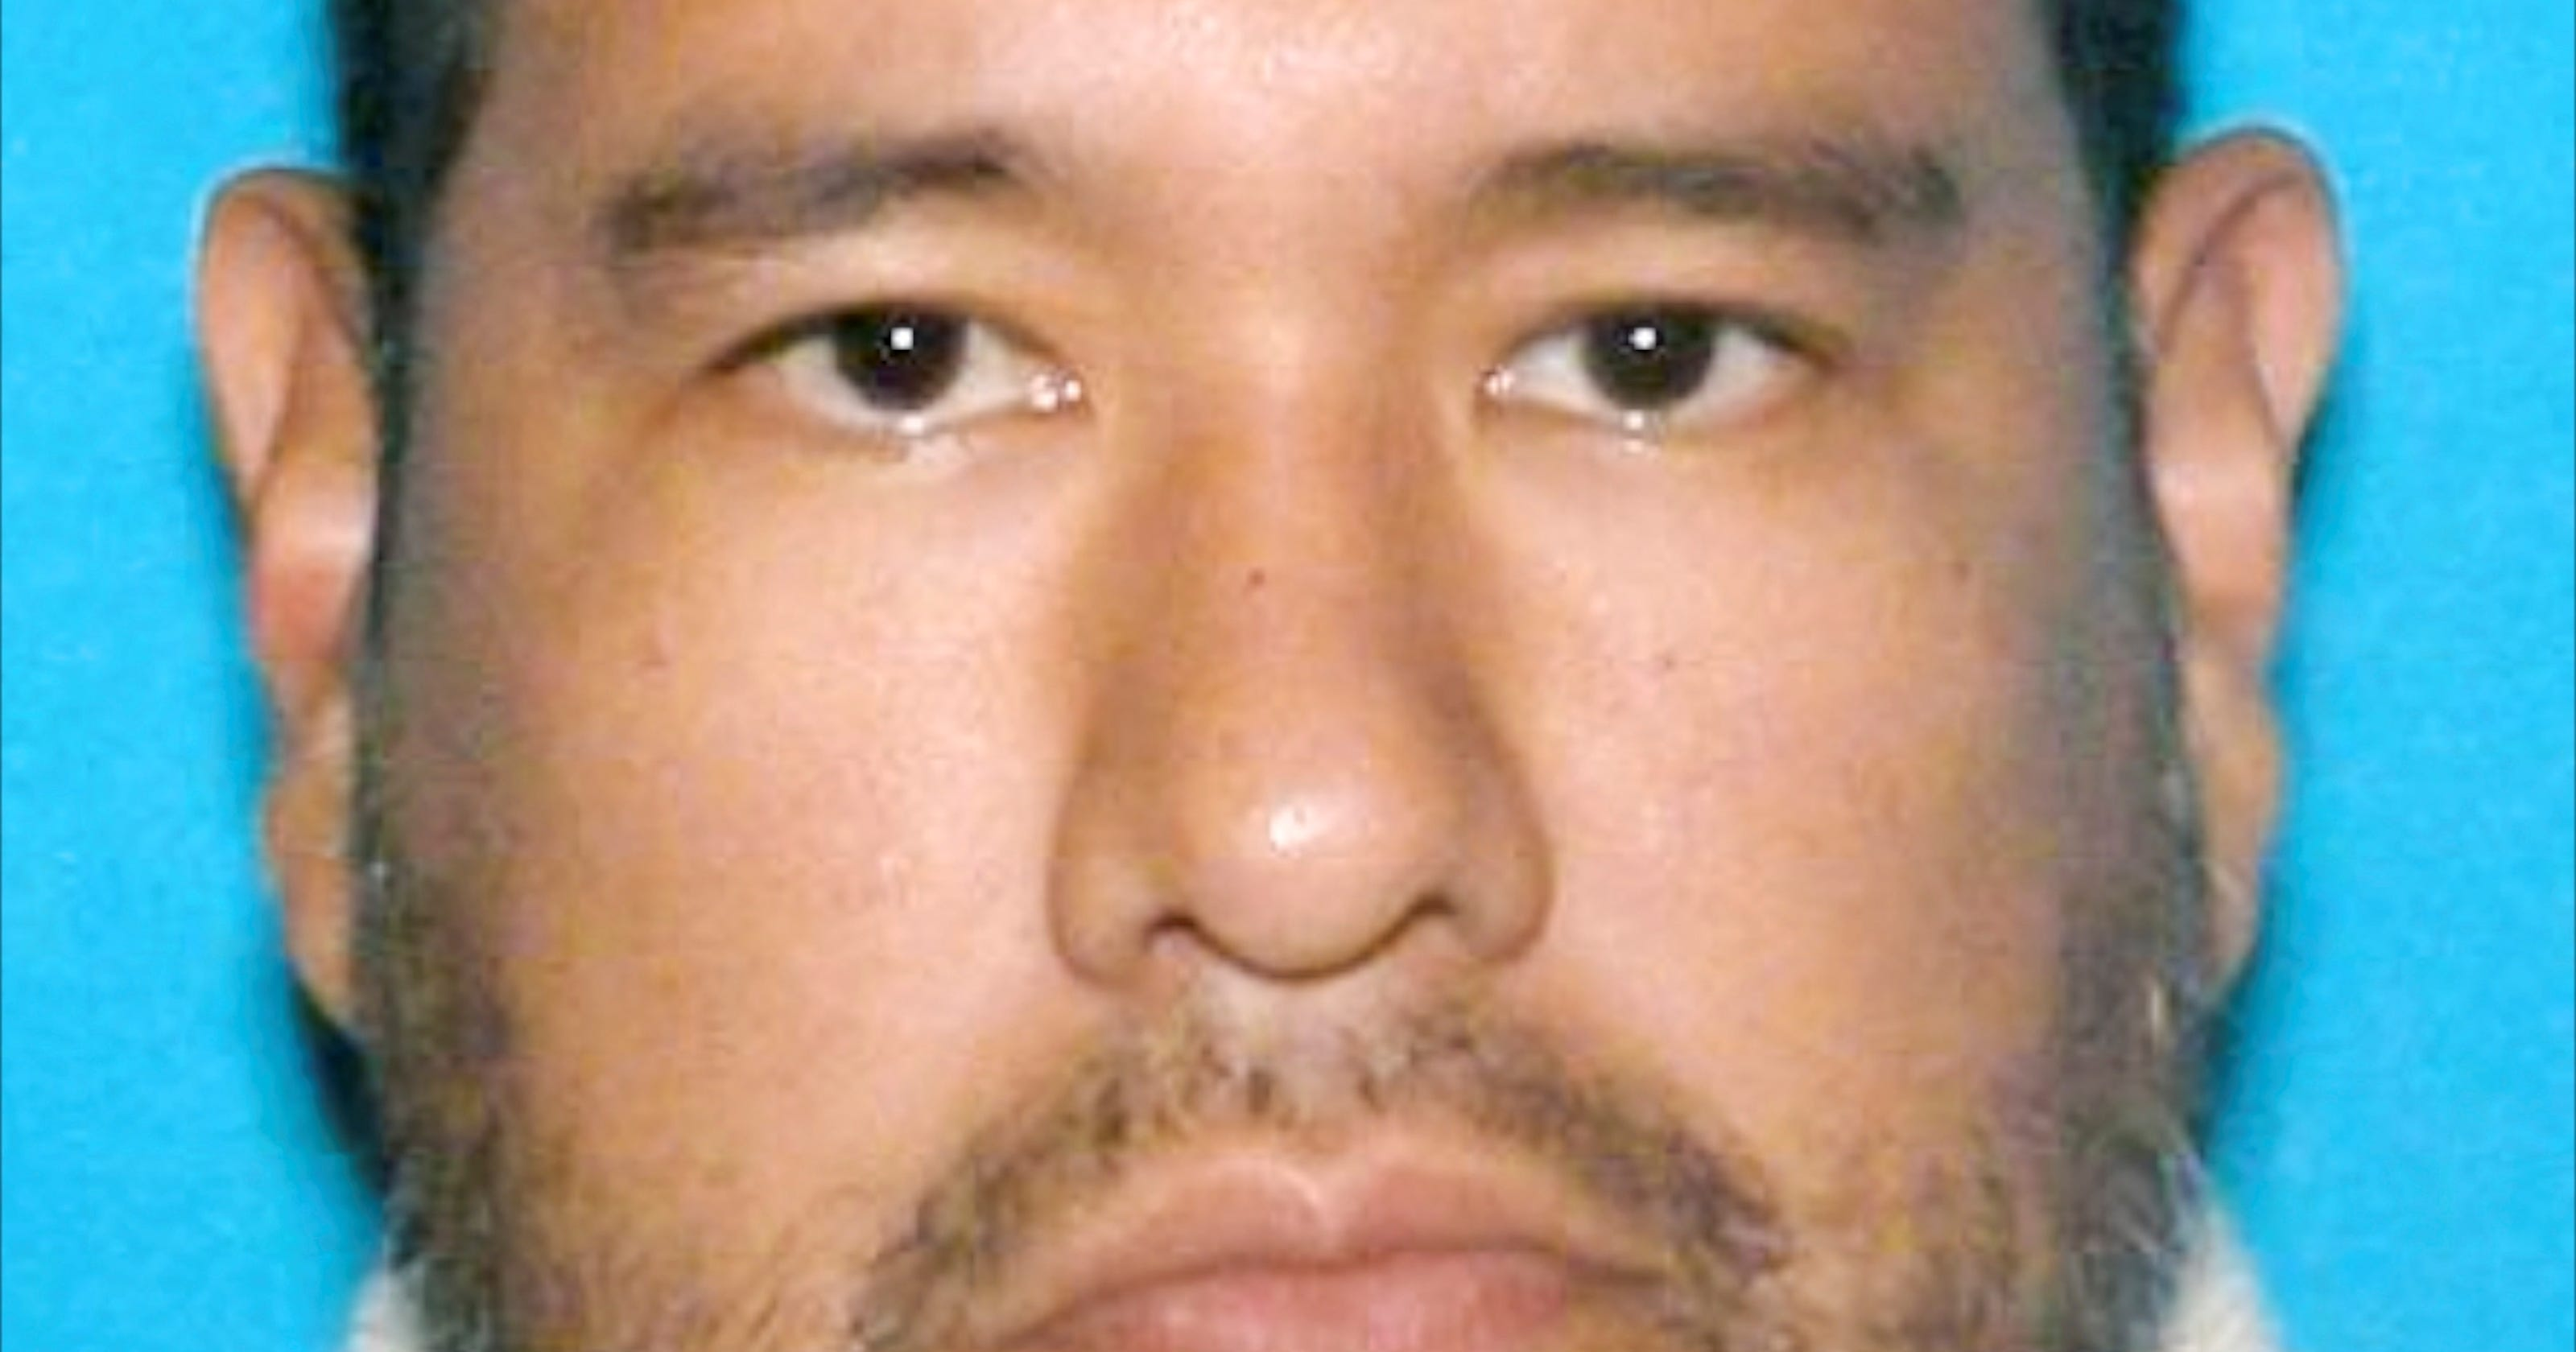 Suspected 'serial killer' doctor had earlier issues